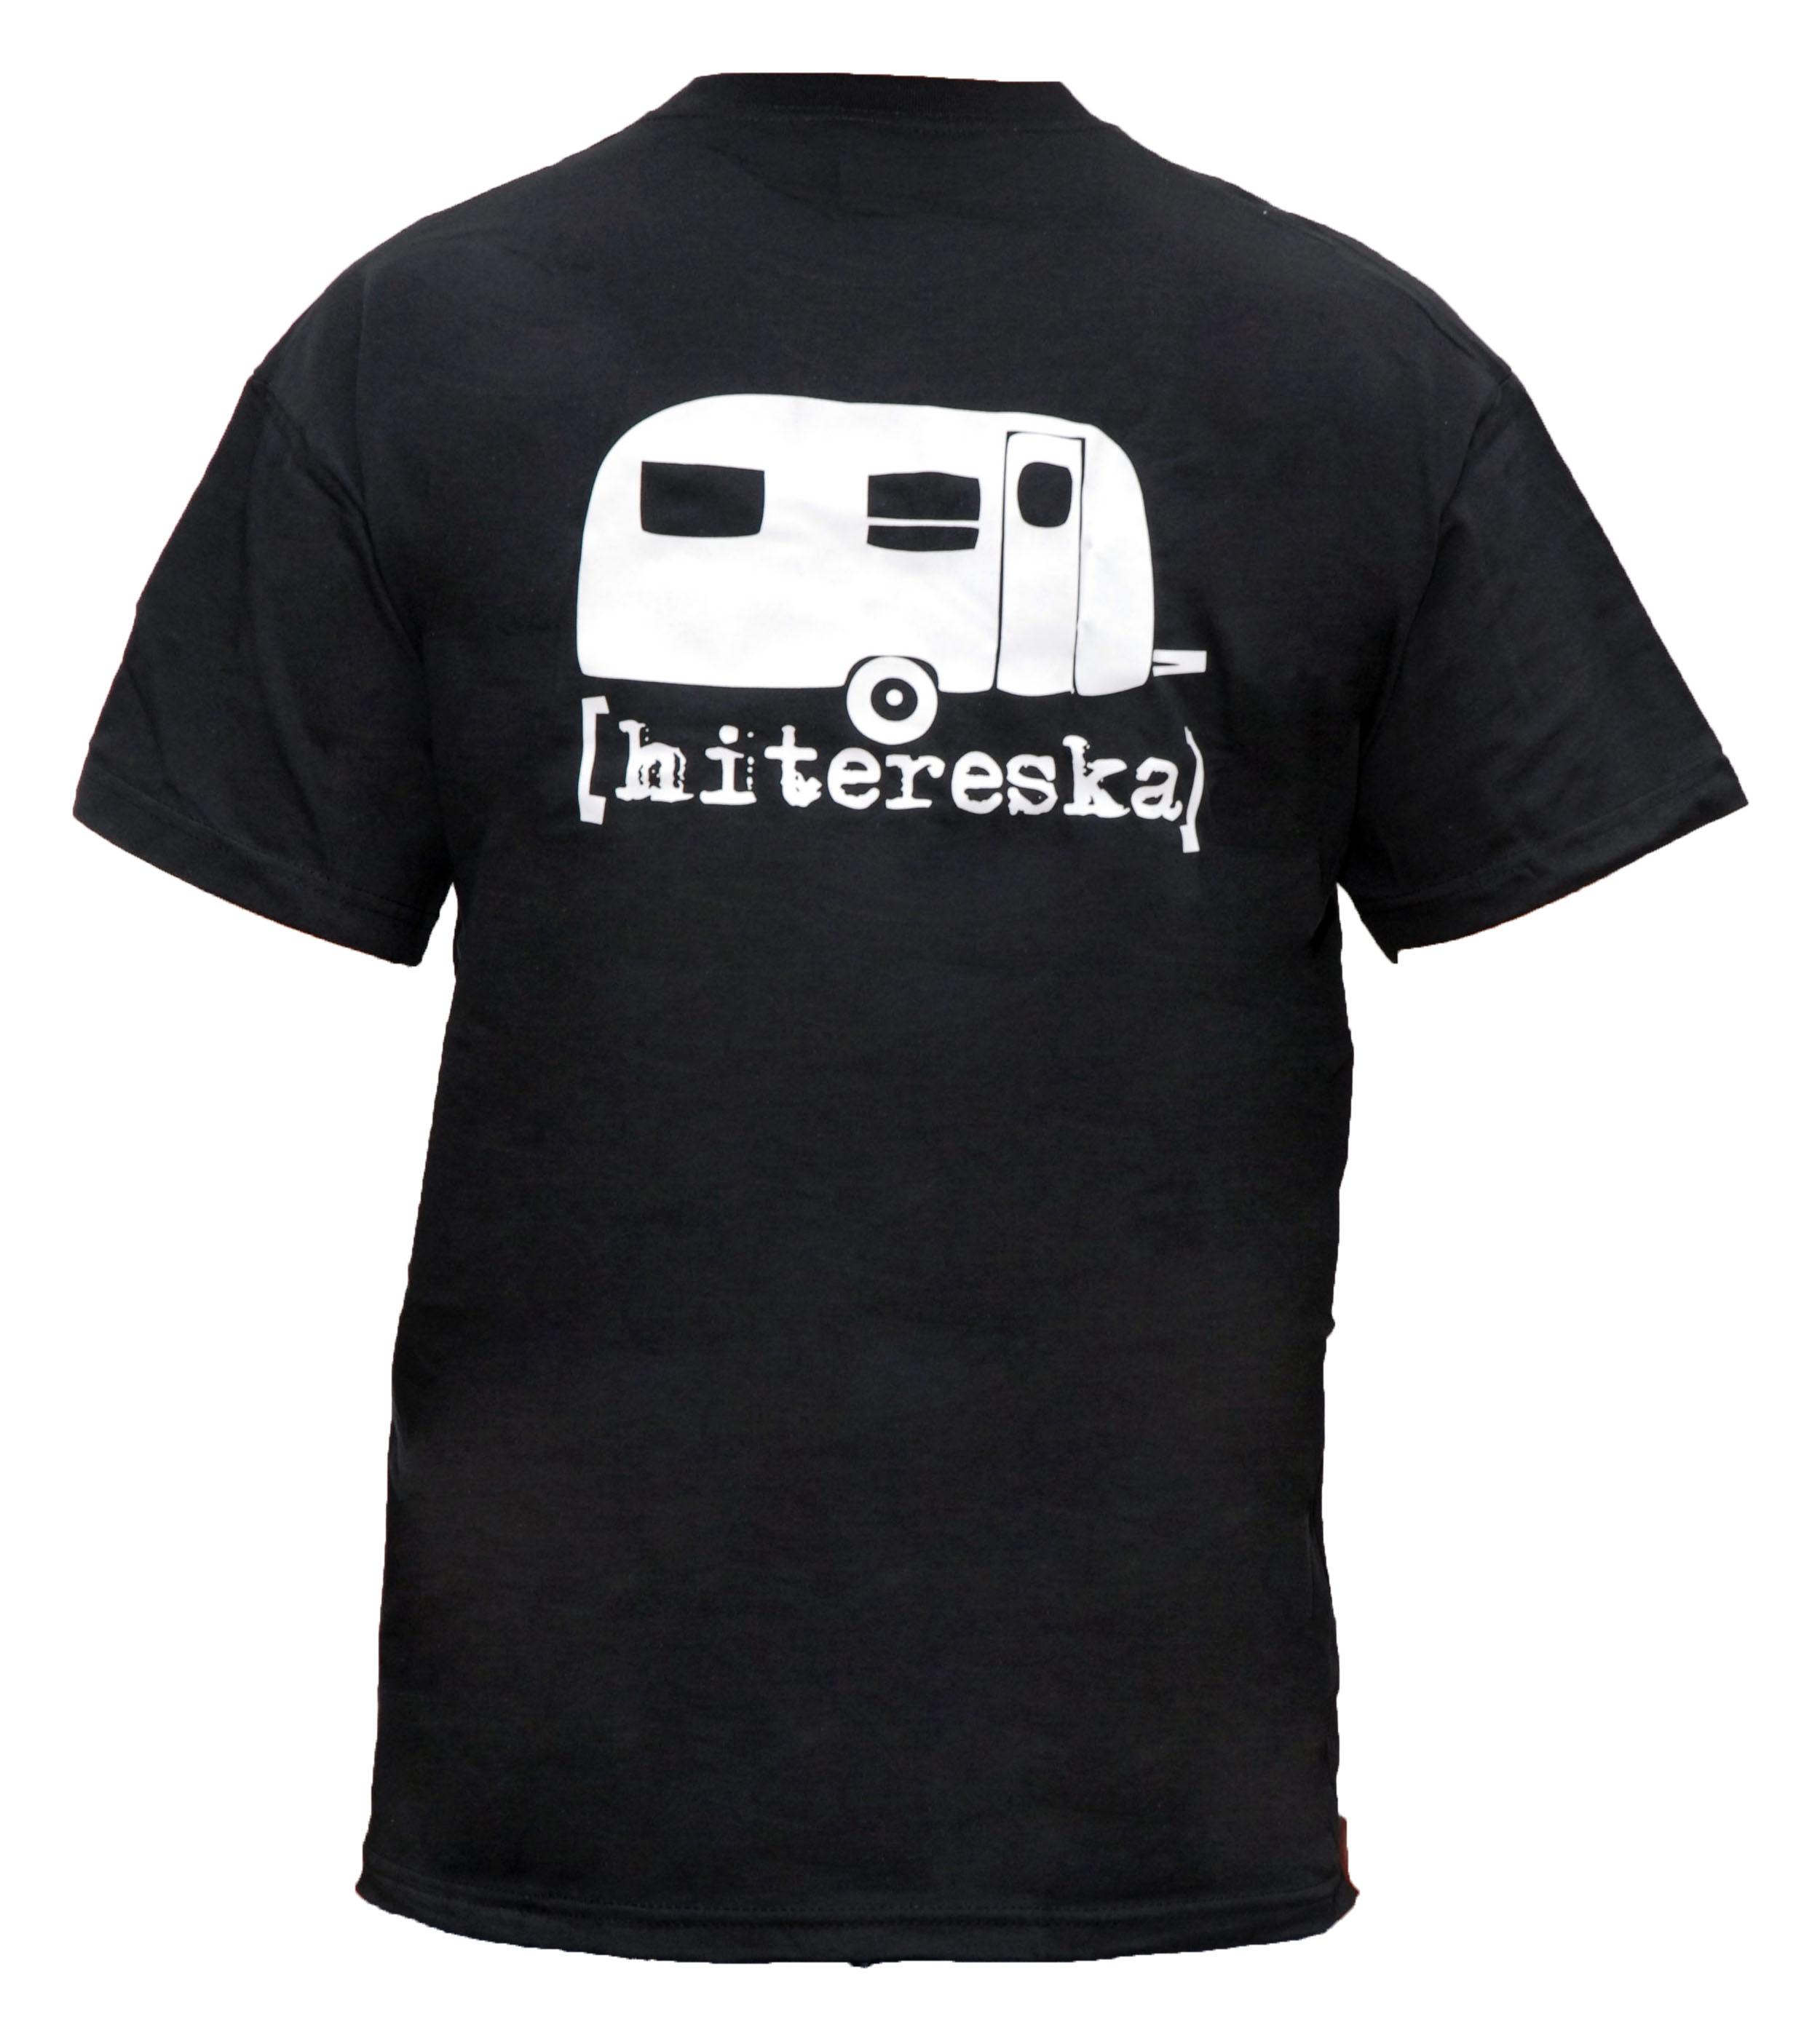 T-Shirt Wohnwagen hinten